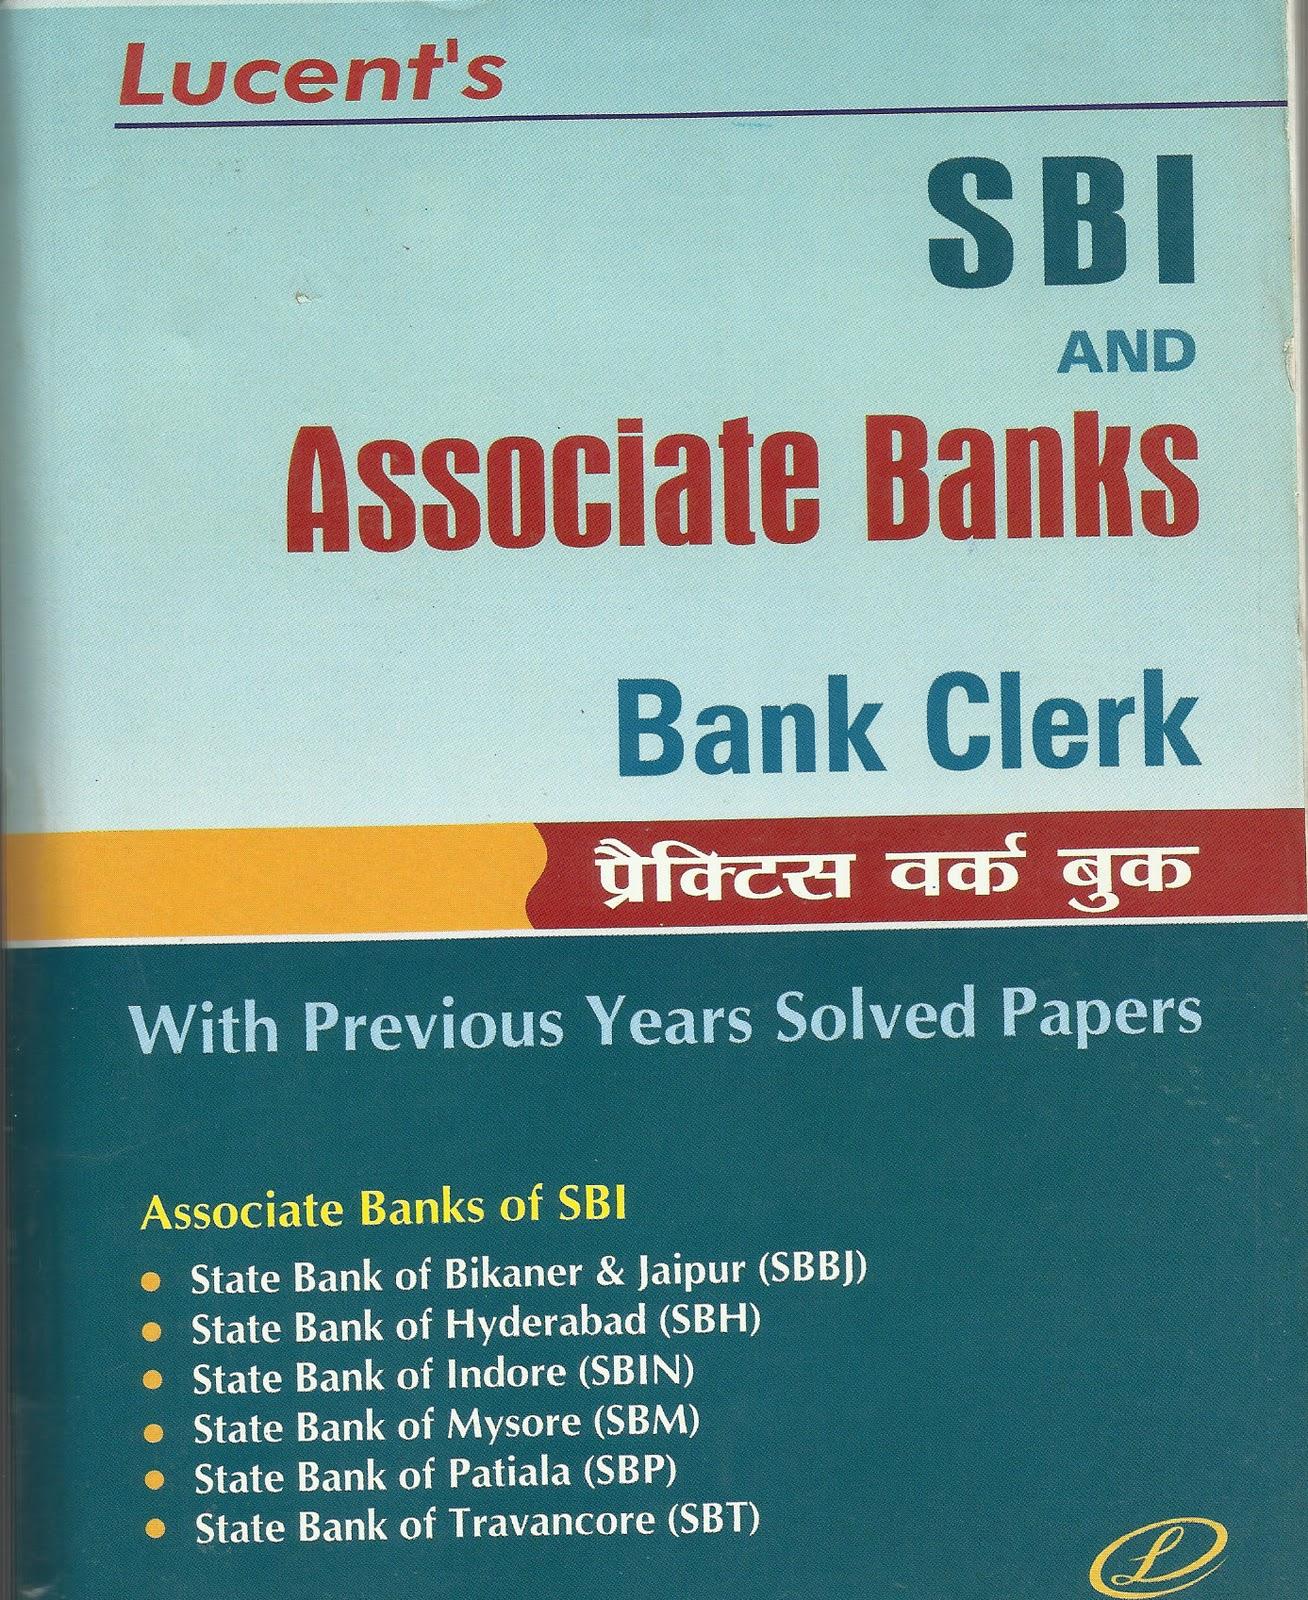 http://4.bp.blogspot.com/-PcpGpDuhsuU/To8nzukse1I/AAAAAAAAAMc/QQTHuJPngnI/s1600/sbi+bank+clerk.jpg